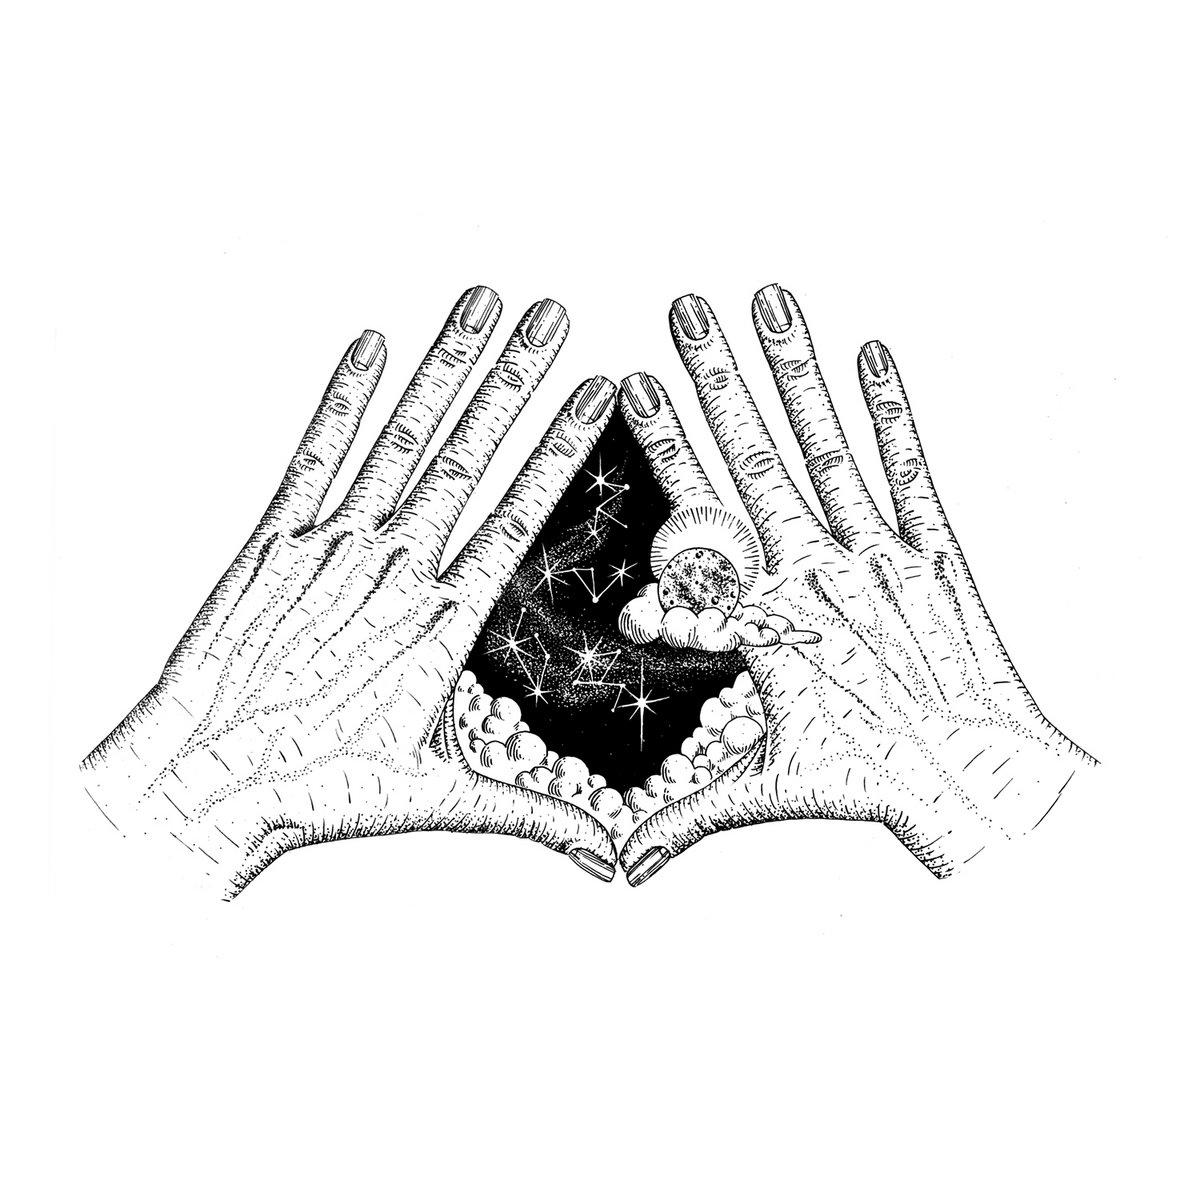 Kiterunner - Solar Cycle [single] (2016)